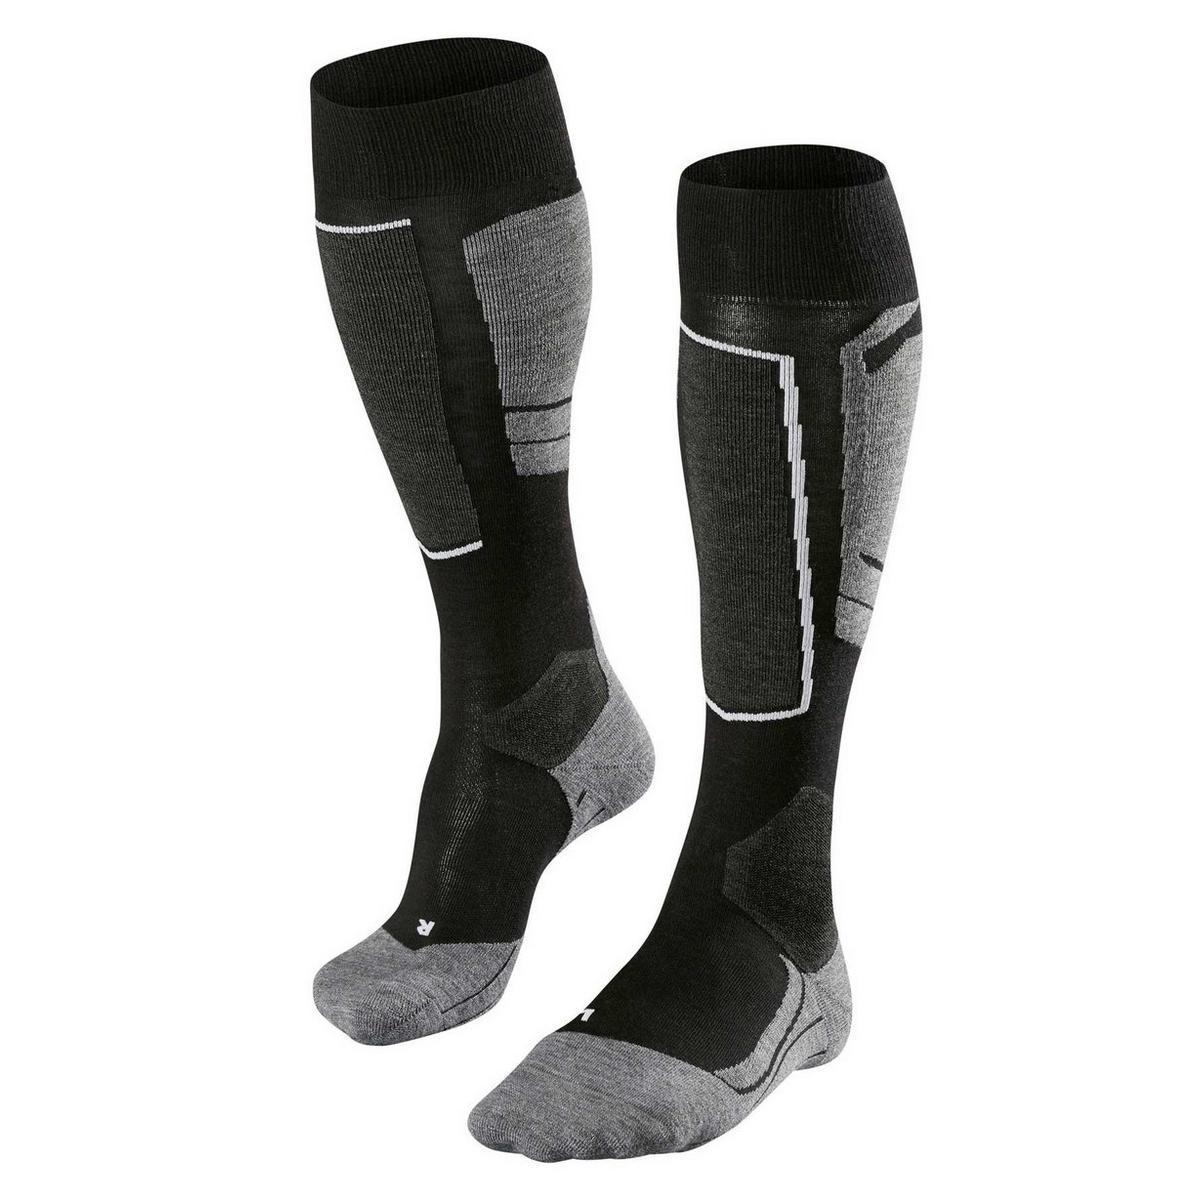 Falke Women's SK4 Ski Socks - Black/Mix